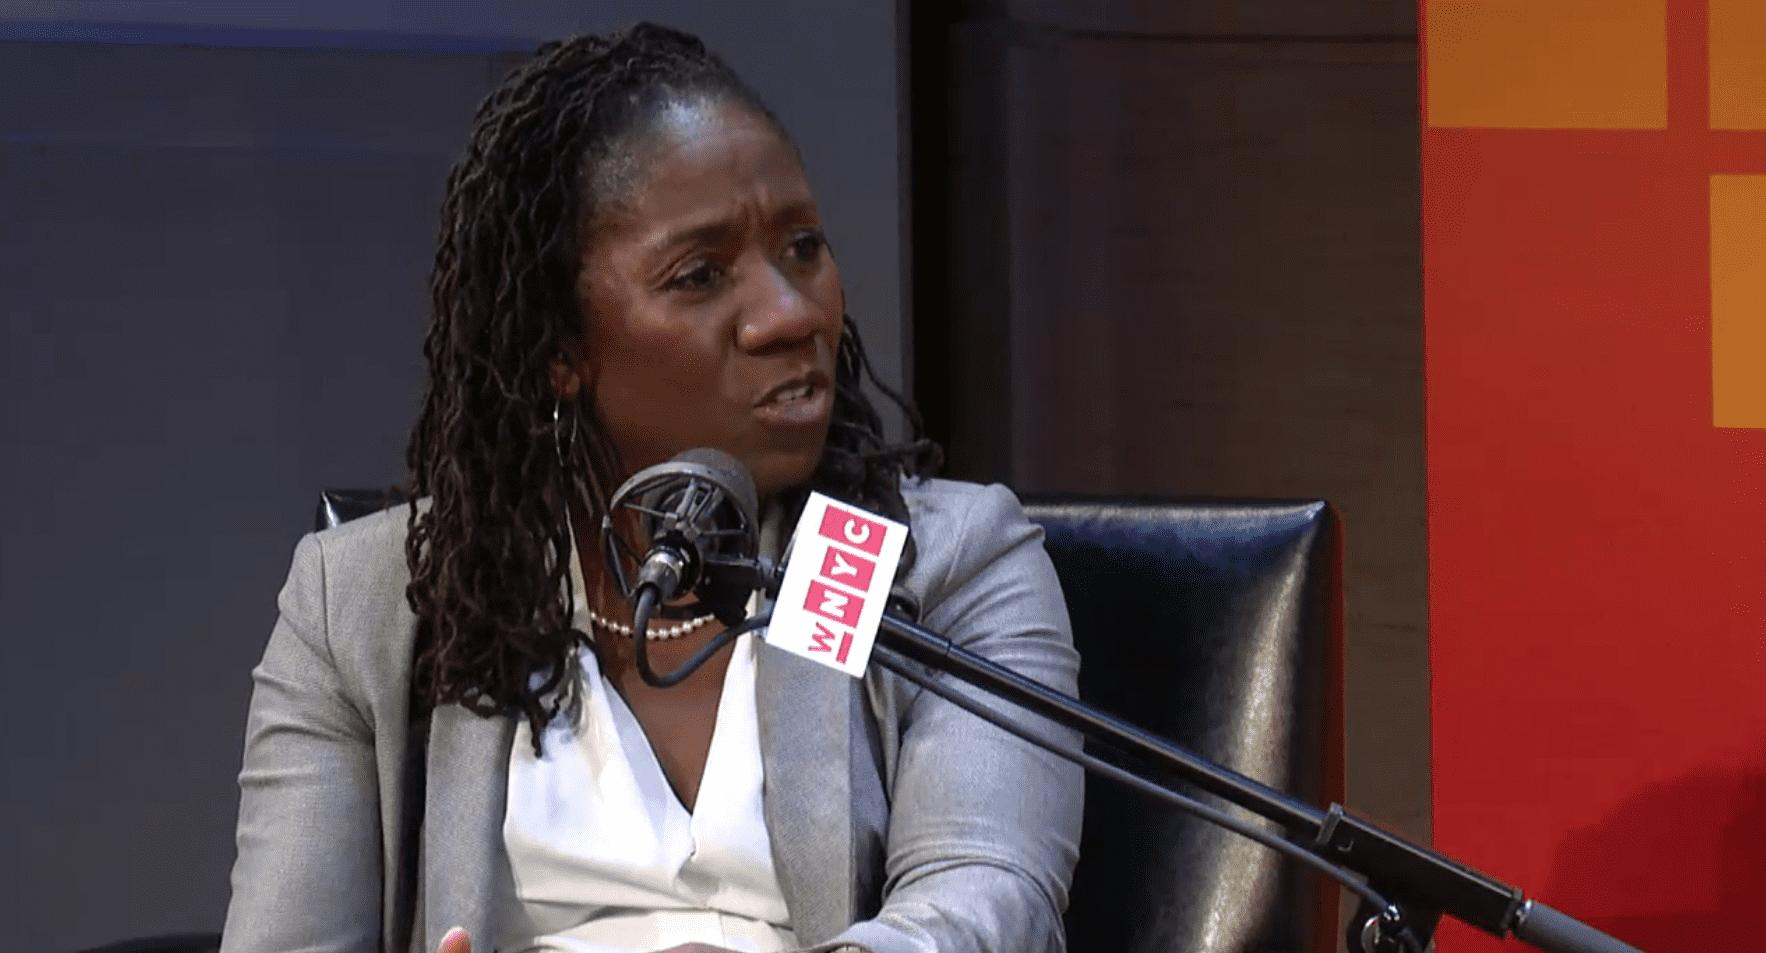 Watch: Keli Goff Talks SCOTUS and the Next POTUS